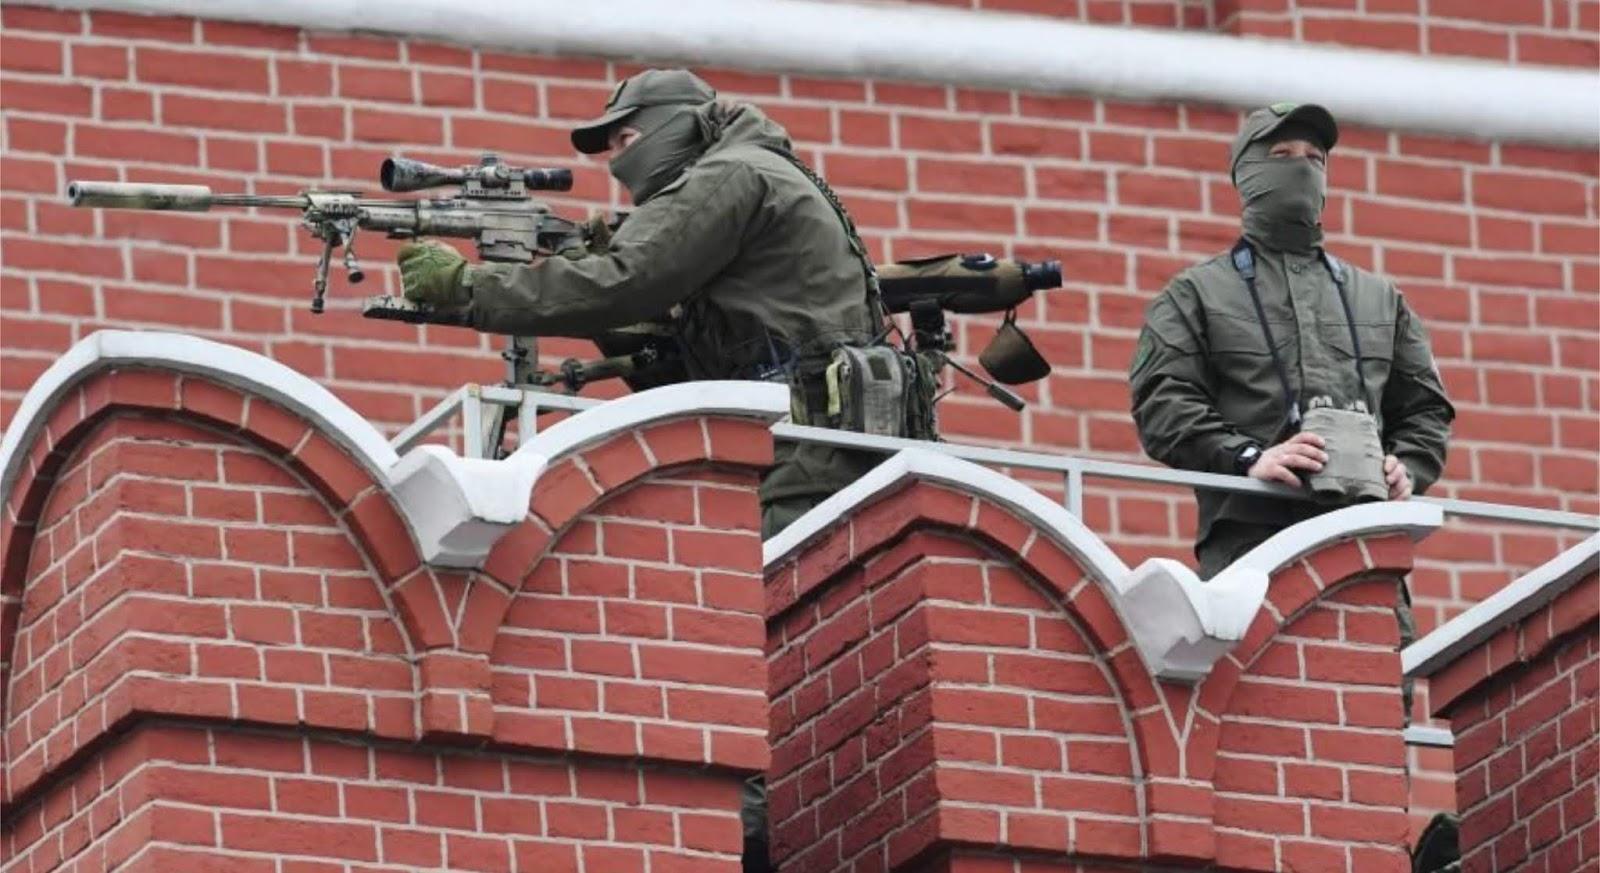 Apa rahasia keakuratan senapan sniper Kremlin (T-5000)